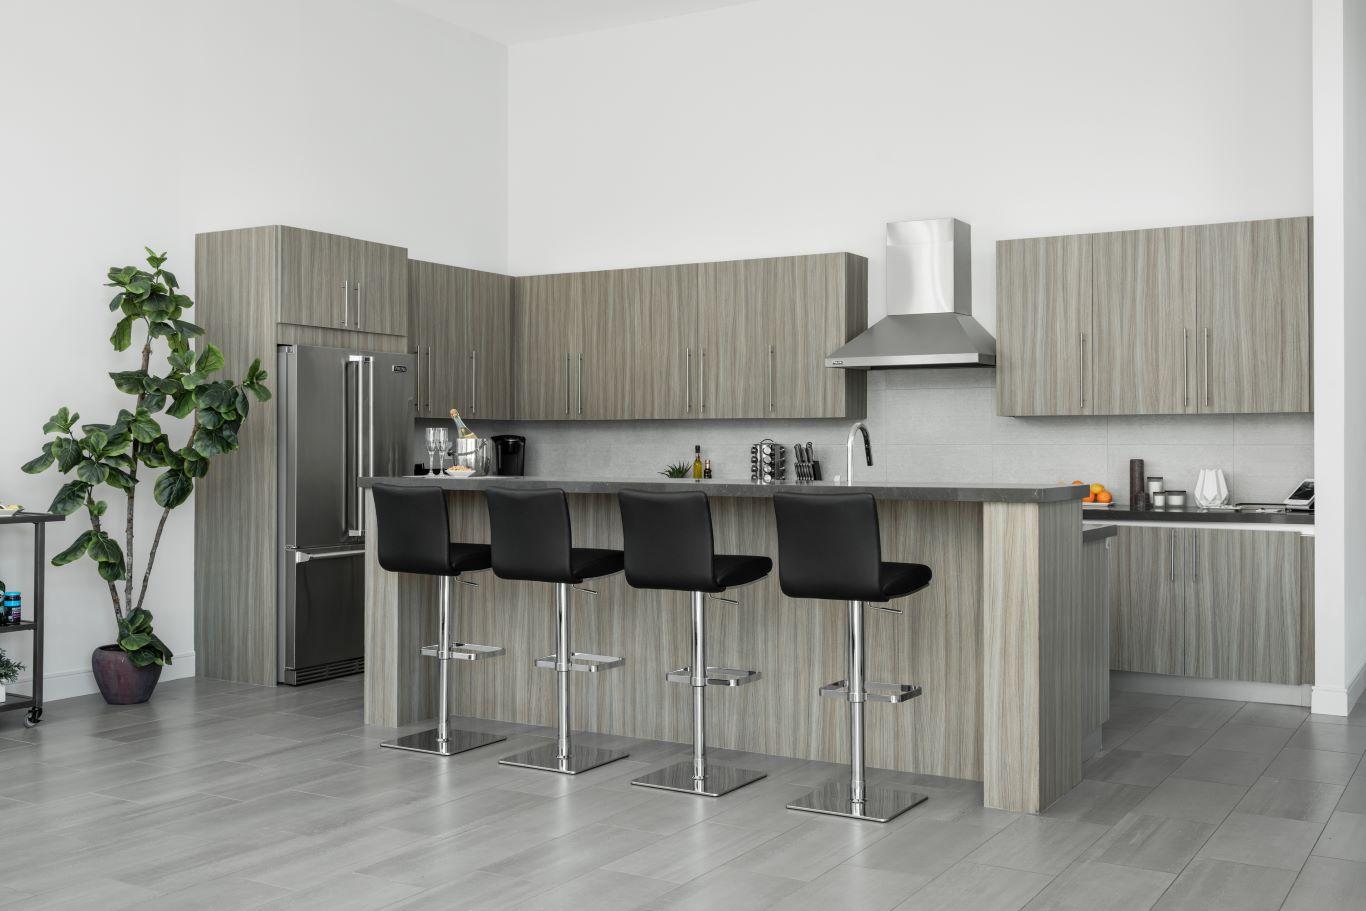 View of Kitchen Bar